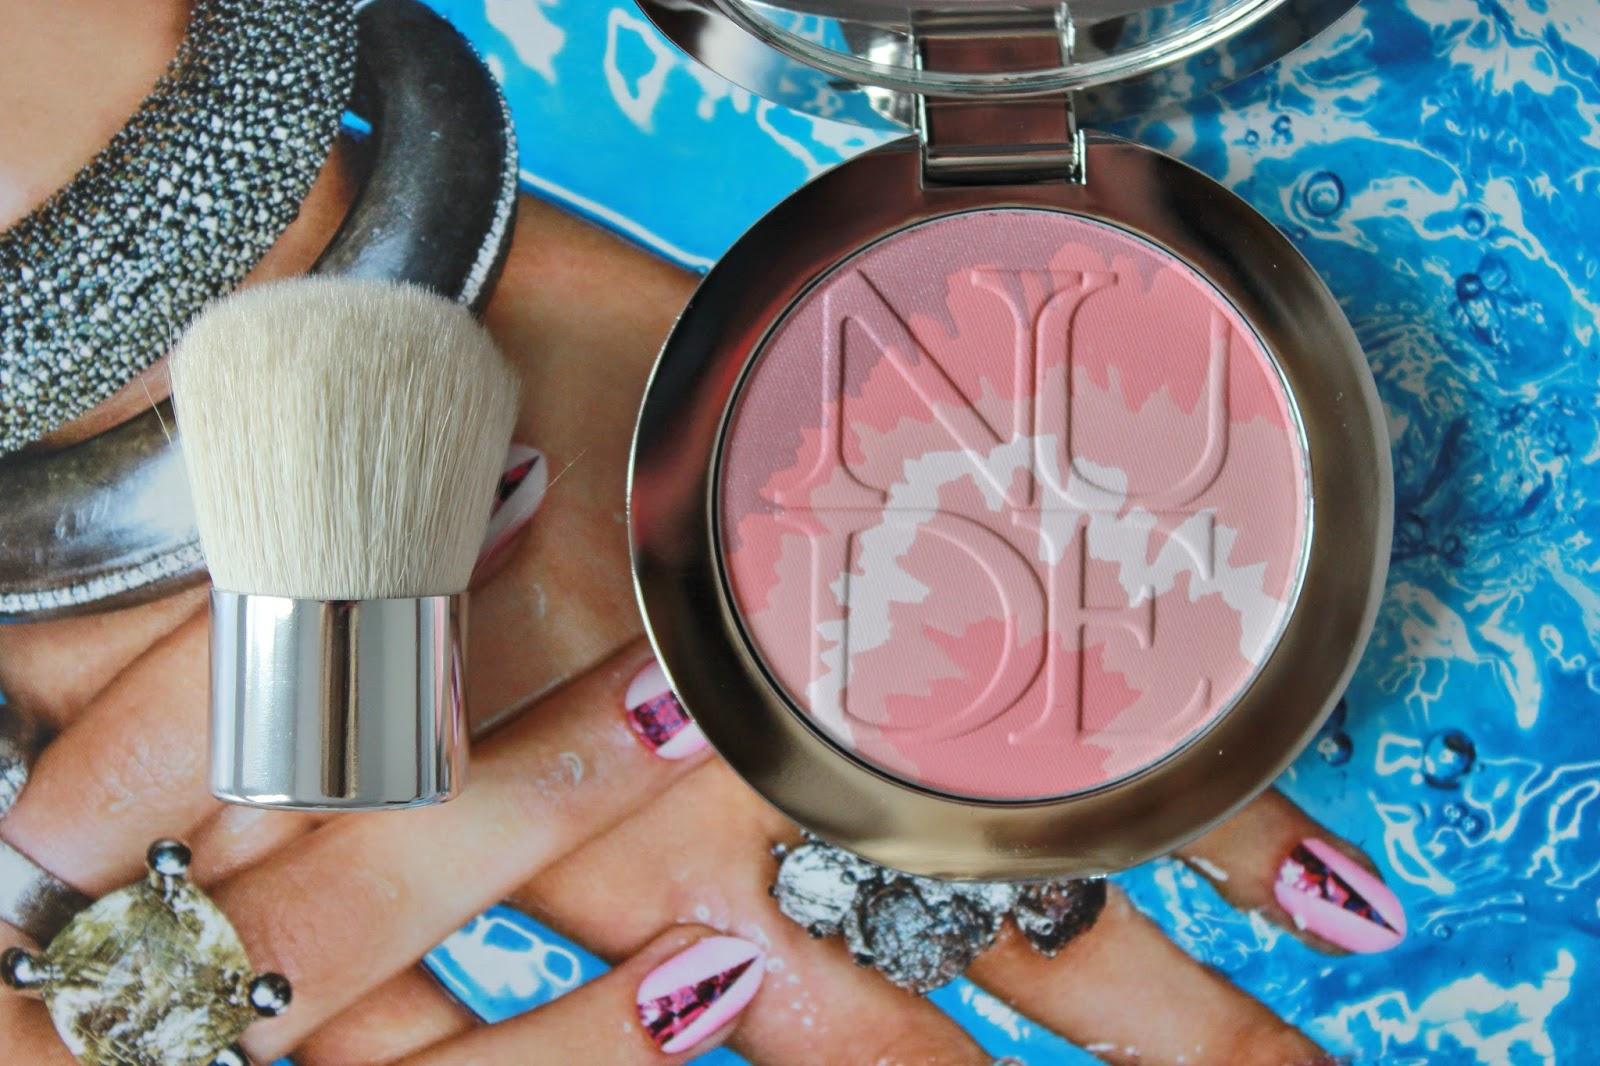 Dior Nude Tan Tie die blusher 001 pink sunrise